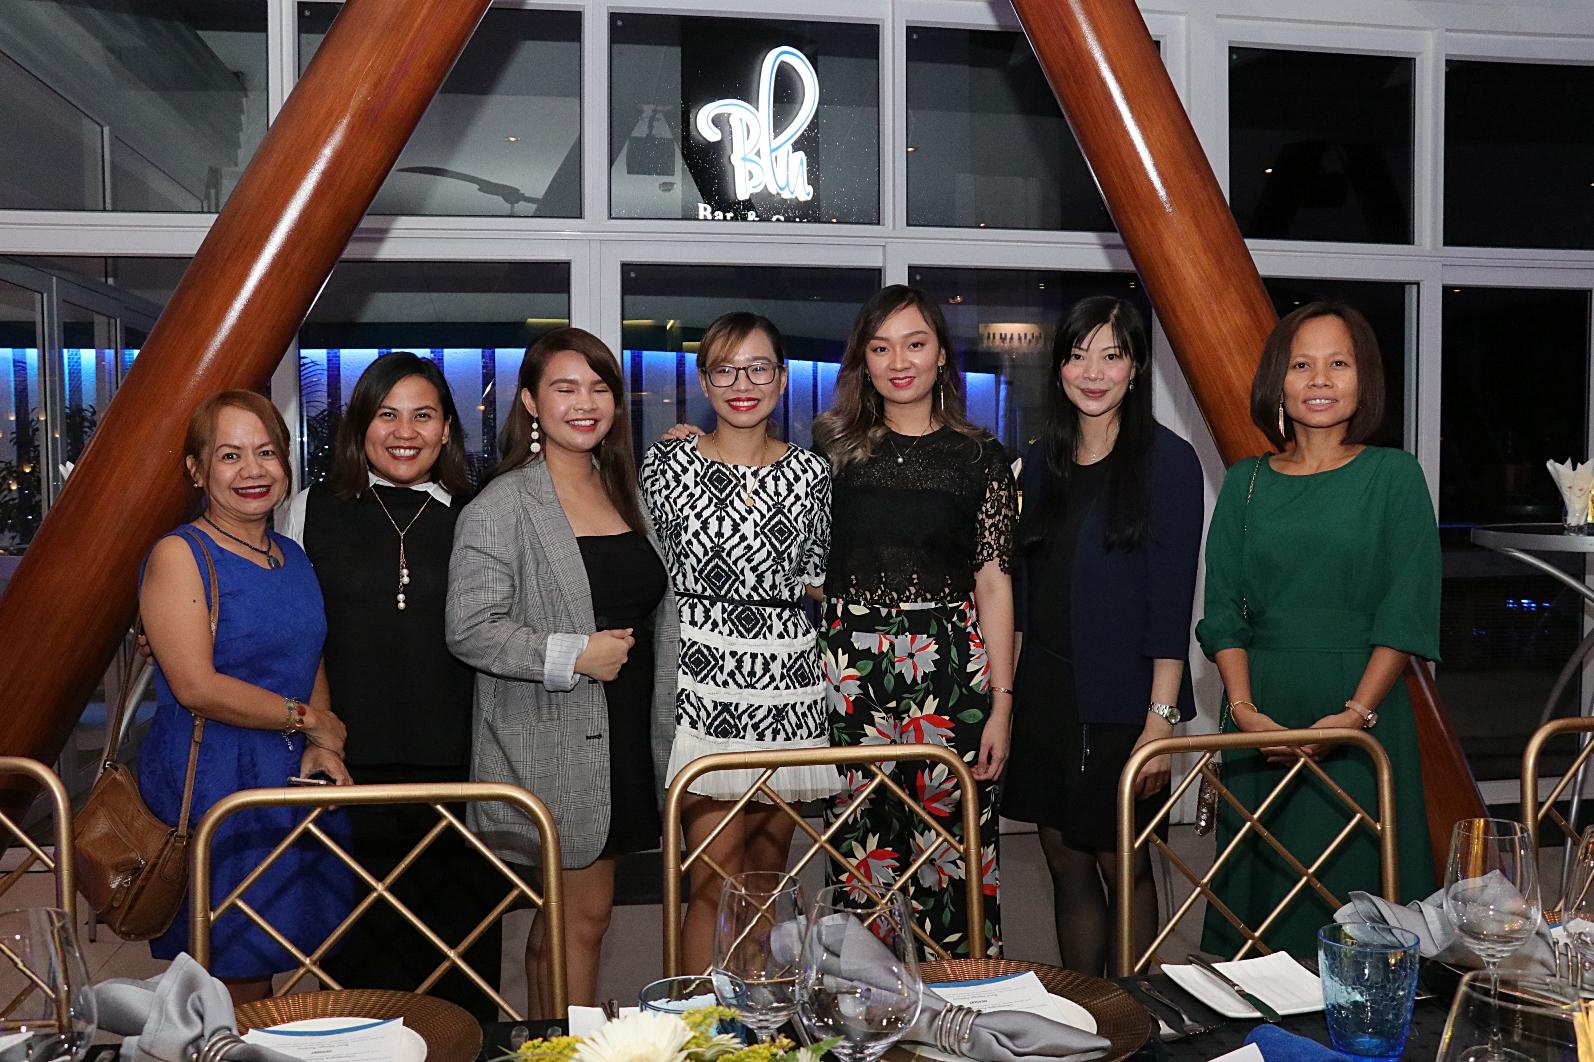 Ehda Dagooc, Manna Alcaraz, Gia Mayola, Katrina Enrera, Jean Yu, Samanatha Poon and Marlen Limpag (2)